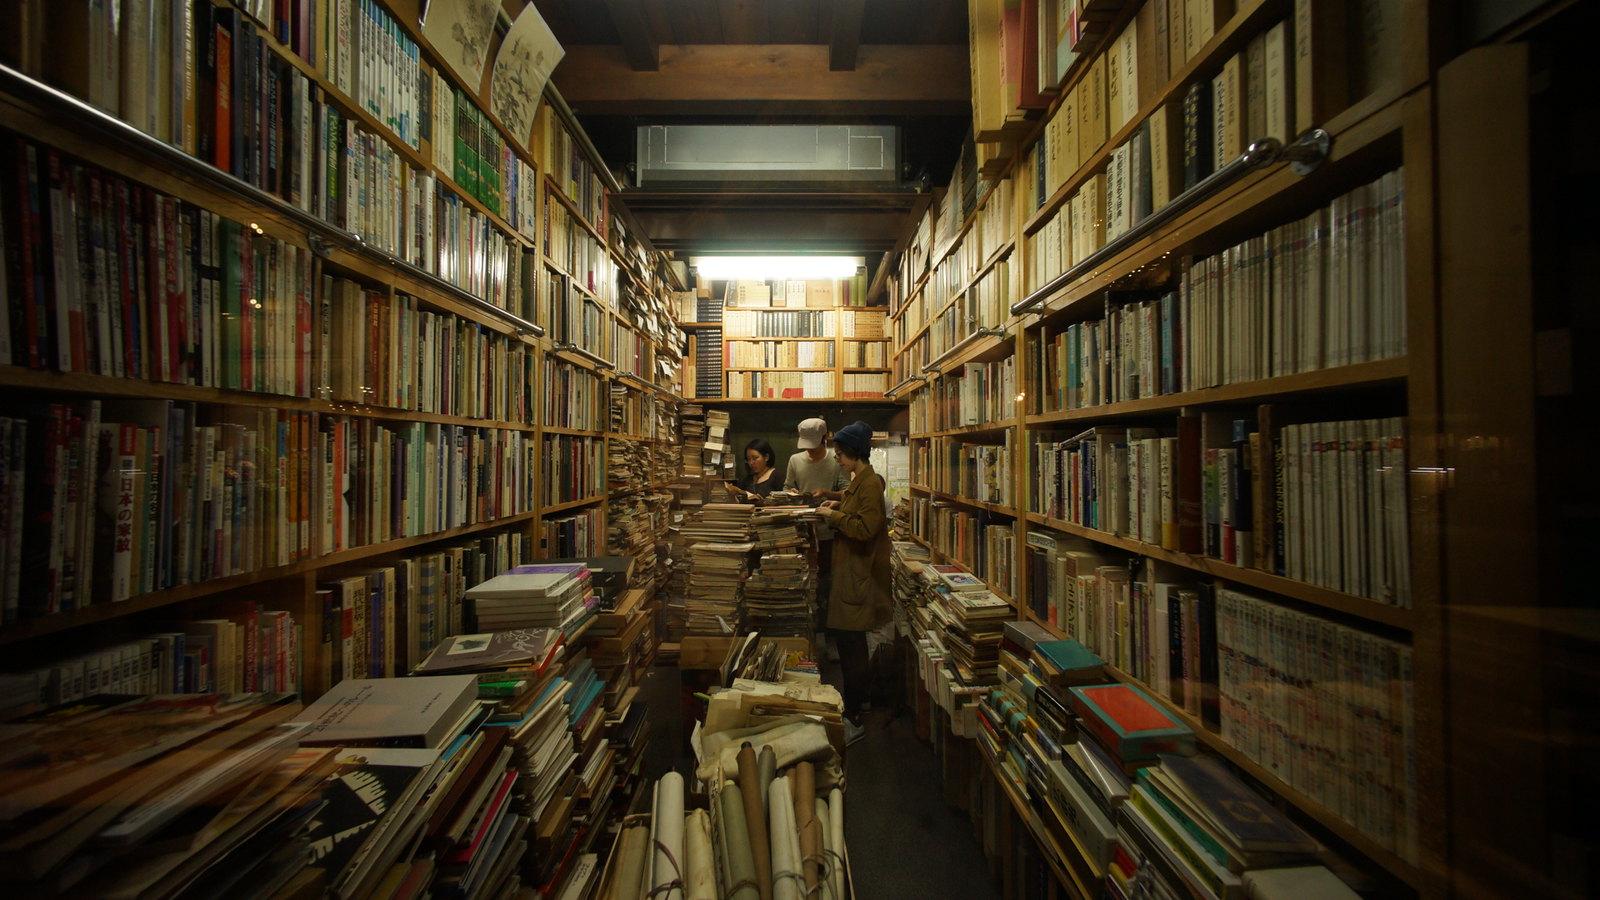 Bookshop in Kyoto